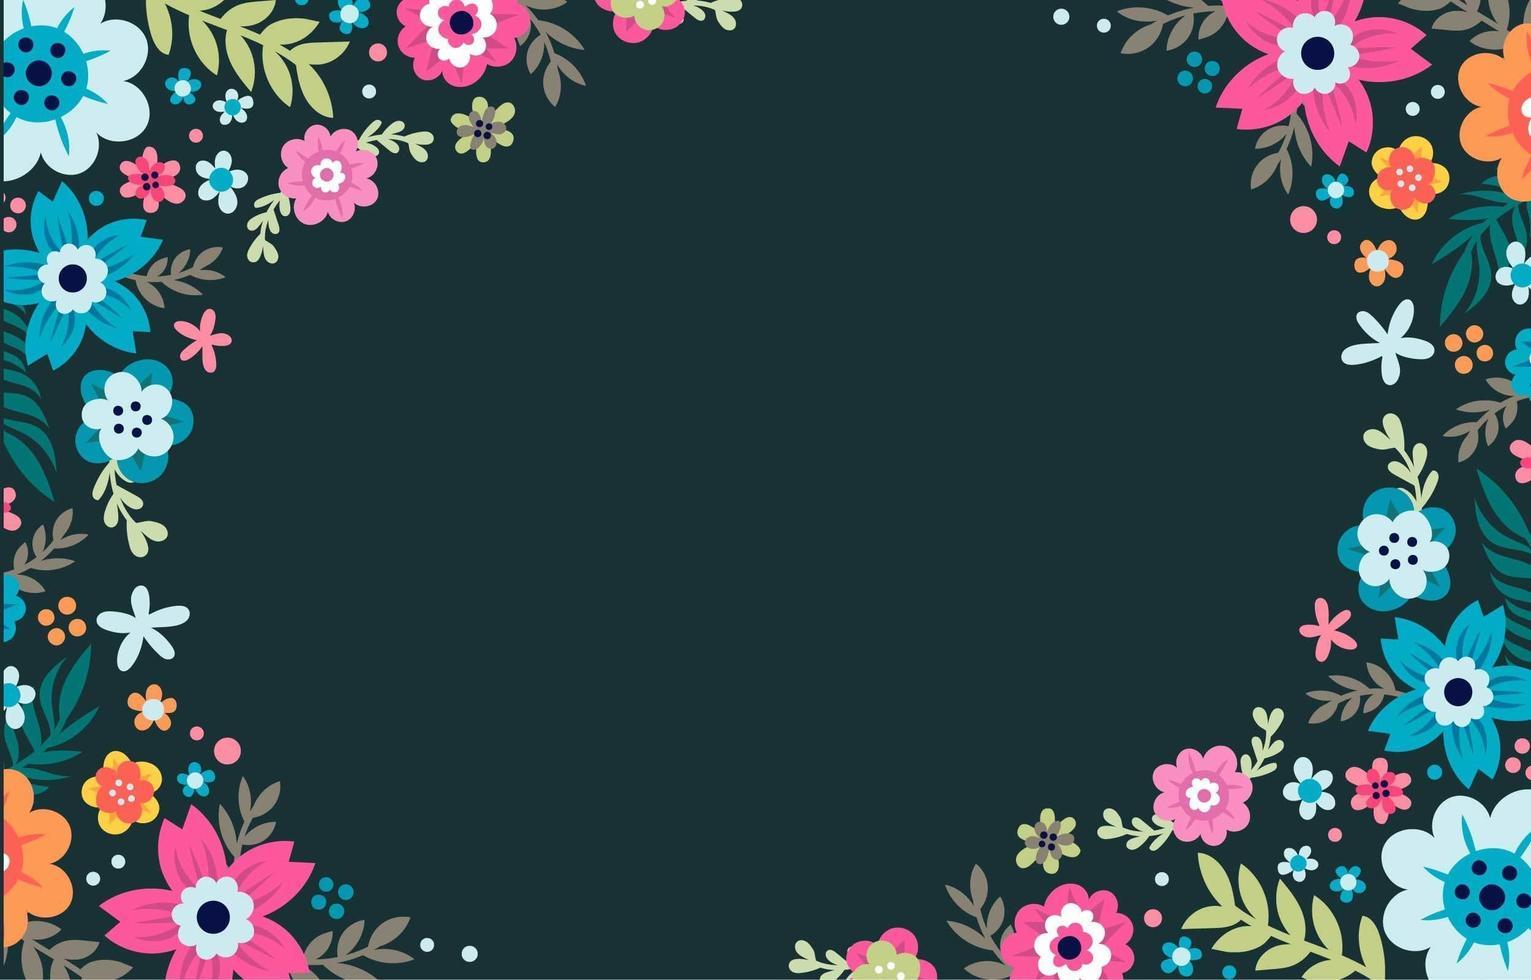 fondo de marco floral colorido vector